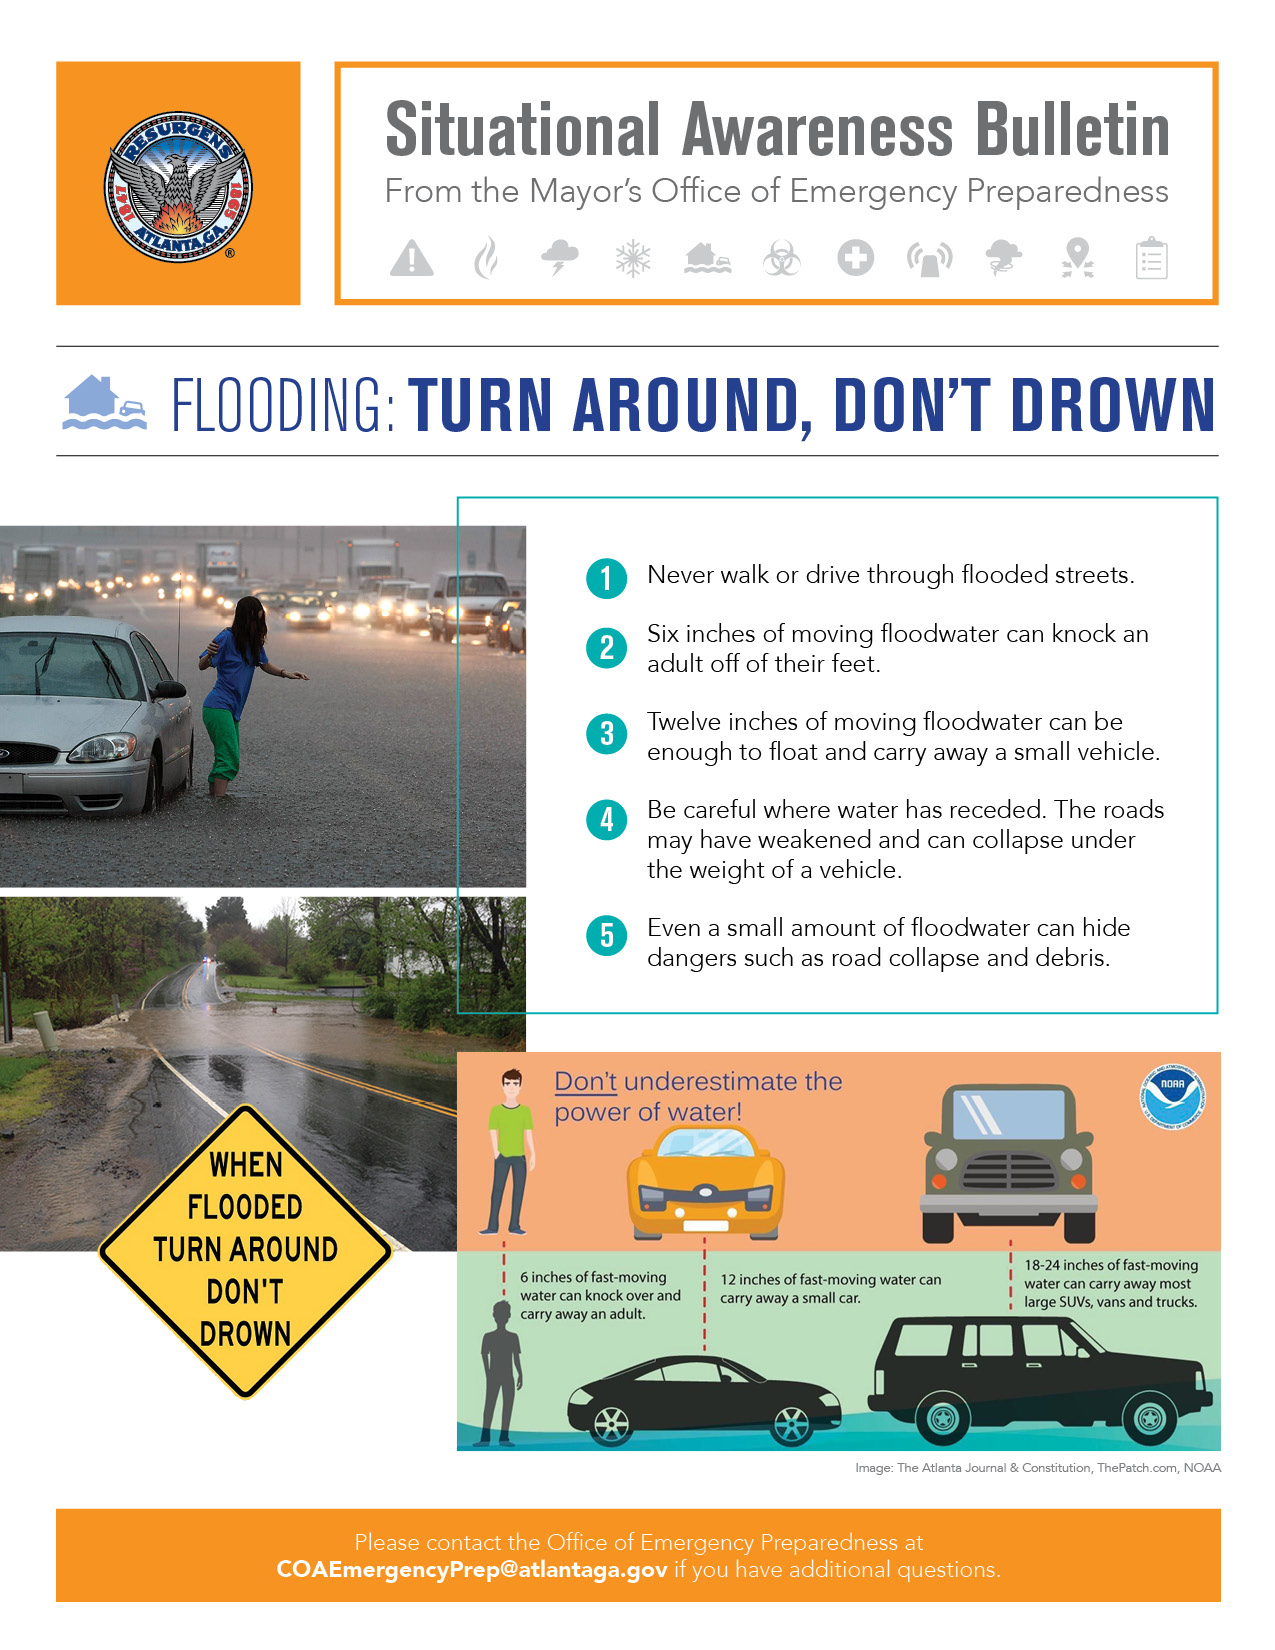 Flooding Turn Around, Don't Drown